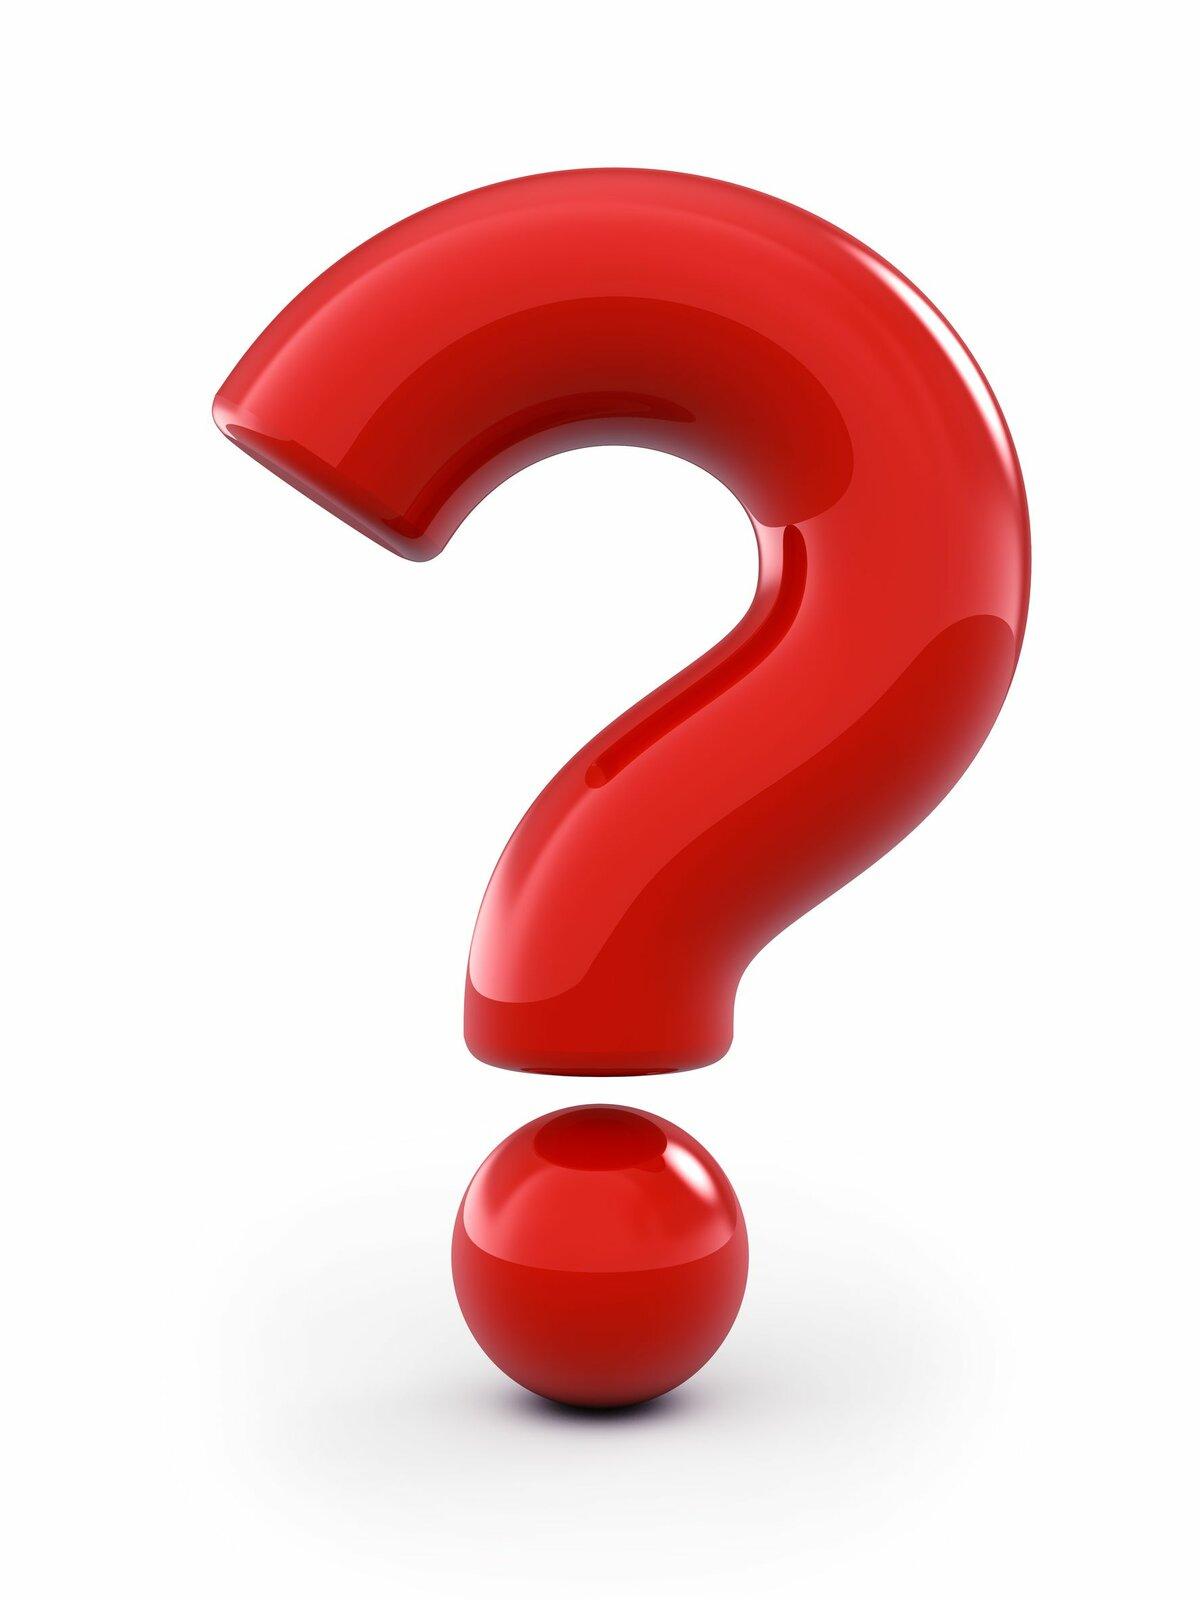 РАЗРАБОТКА логотипа для ЖИЛОГО КОМПЛЕКСА премиум В АНАПЕ.  фото f_1365deeb45357763.jpg